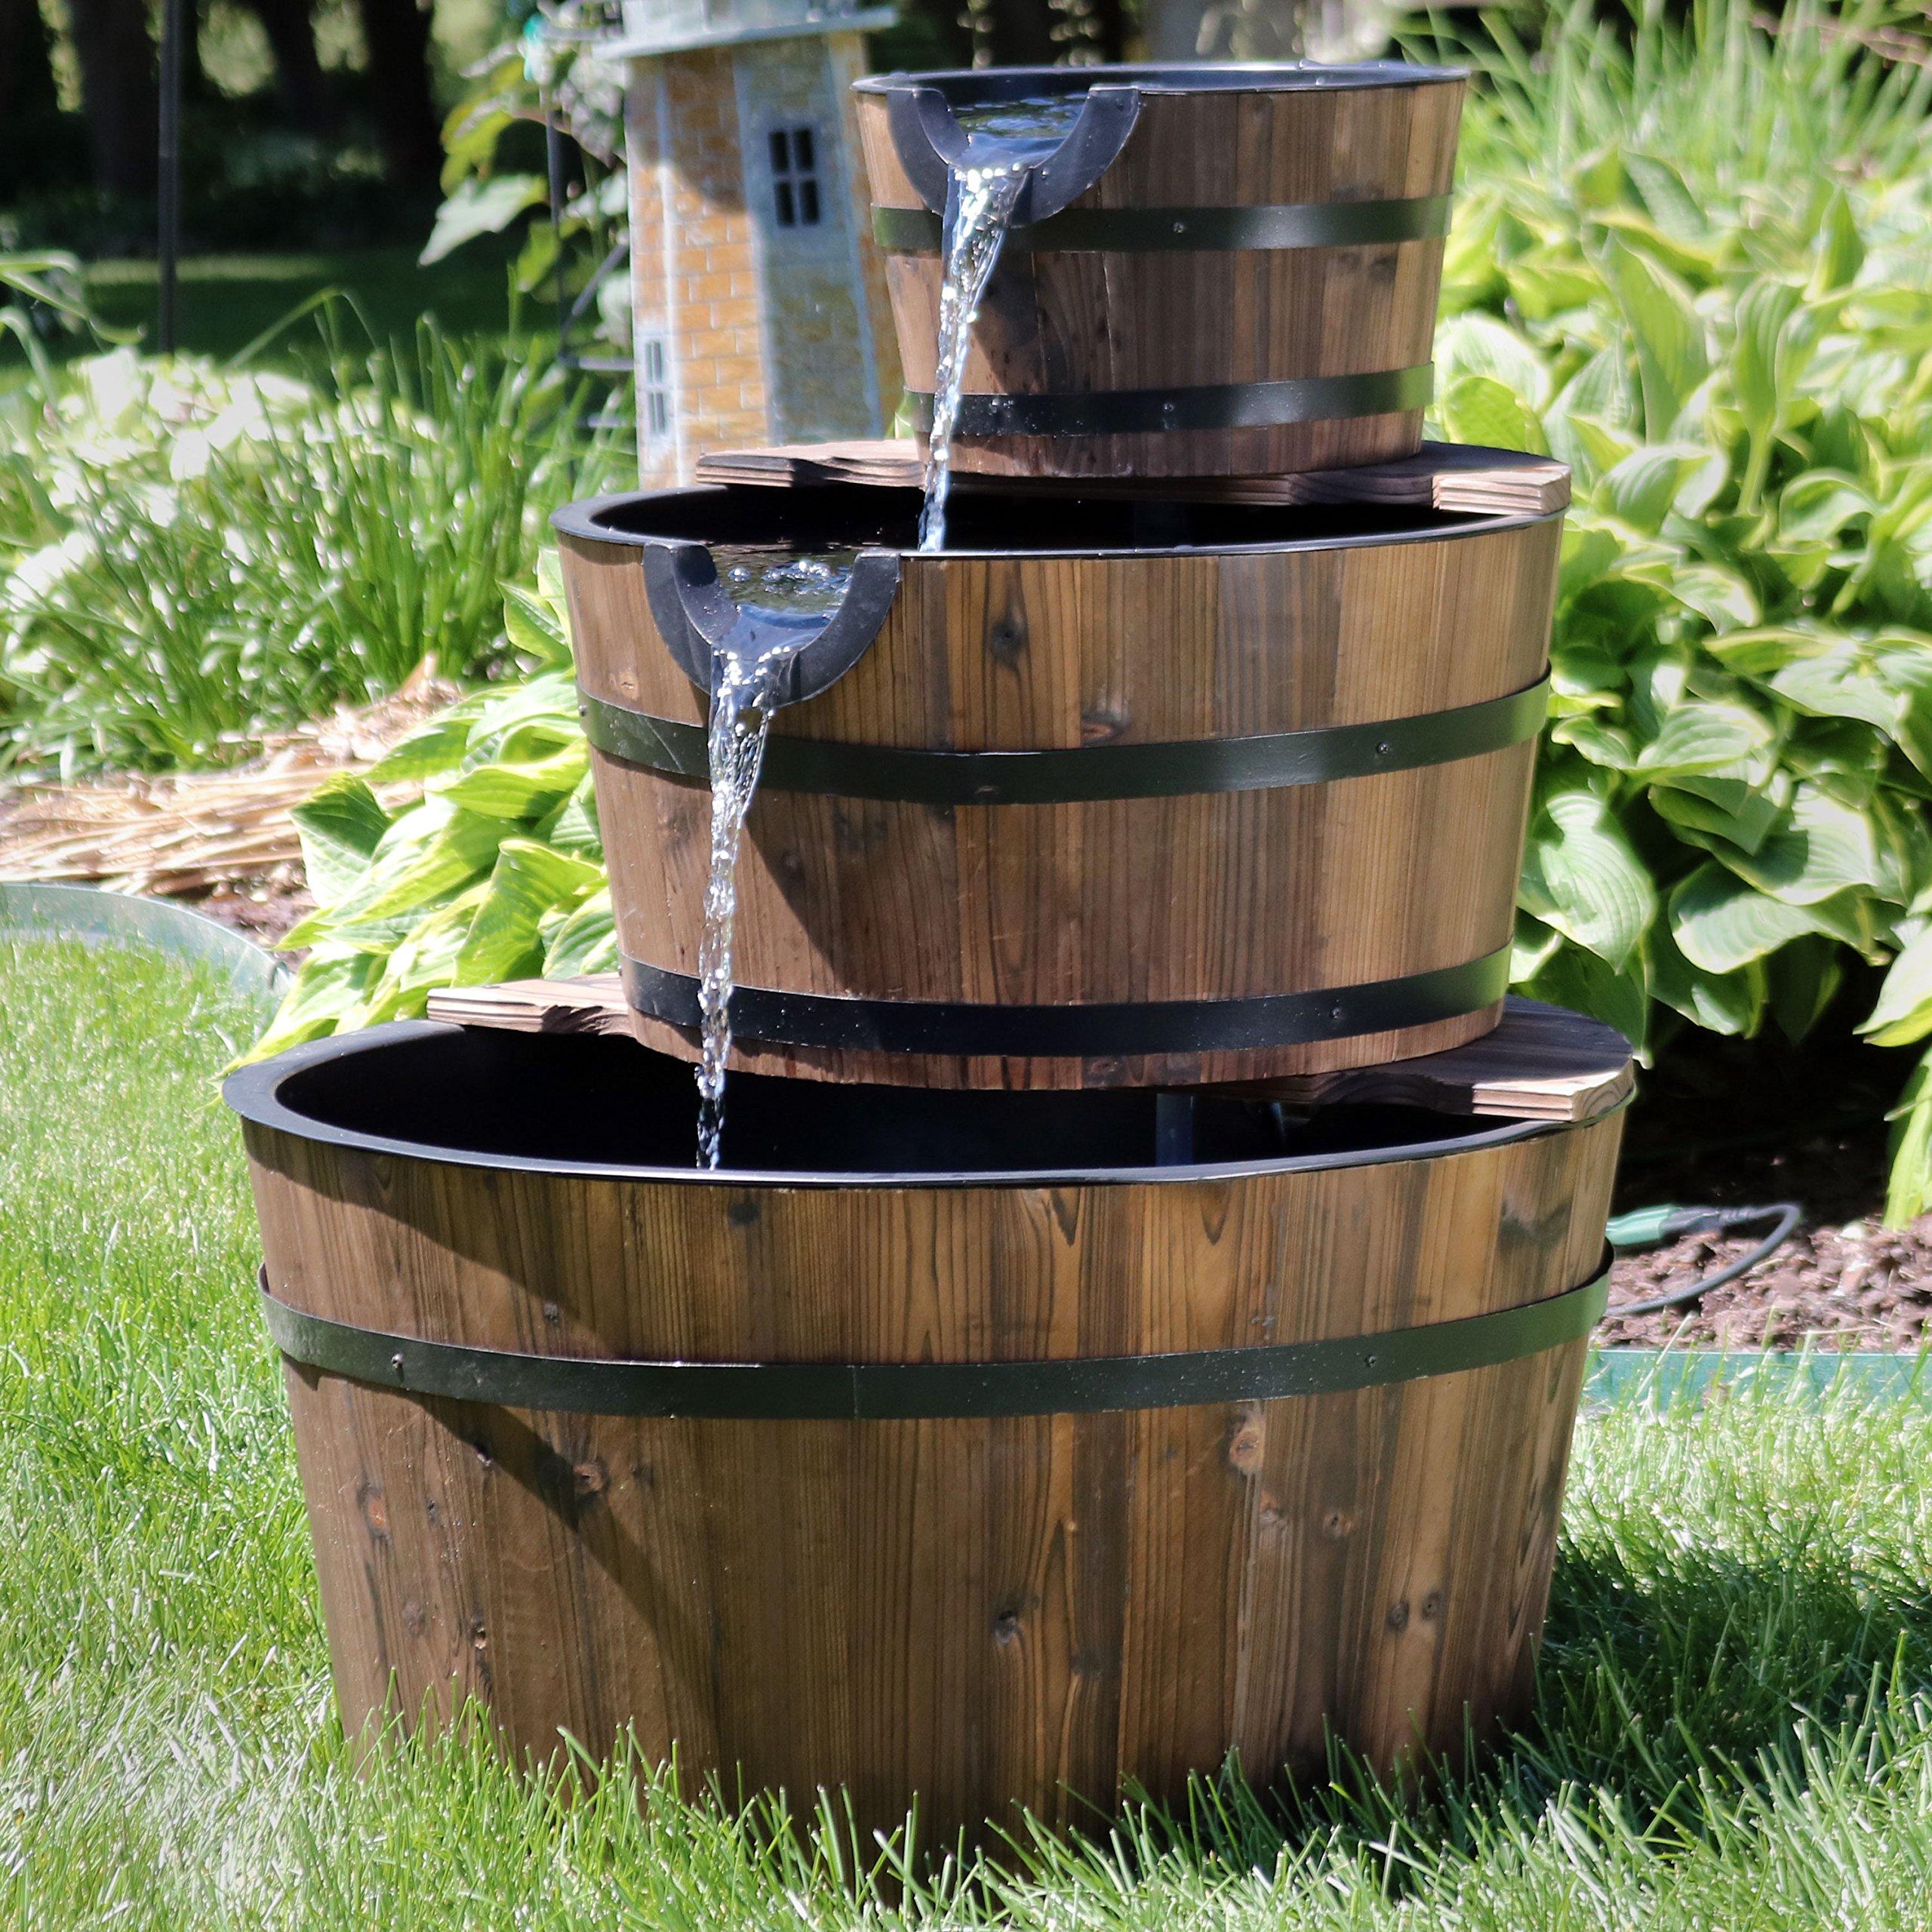 Sunnydaze Wood Barrel Water Fountain - 3-Tier Waterfall ...